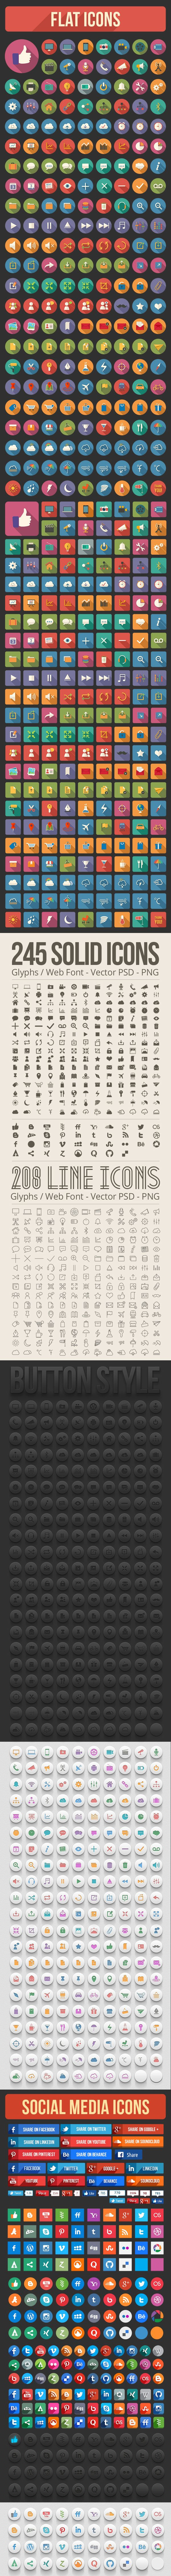 Icons pack by Hakan Ertan, via Behance